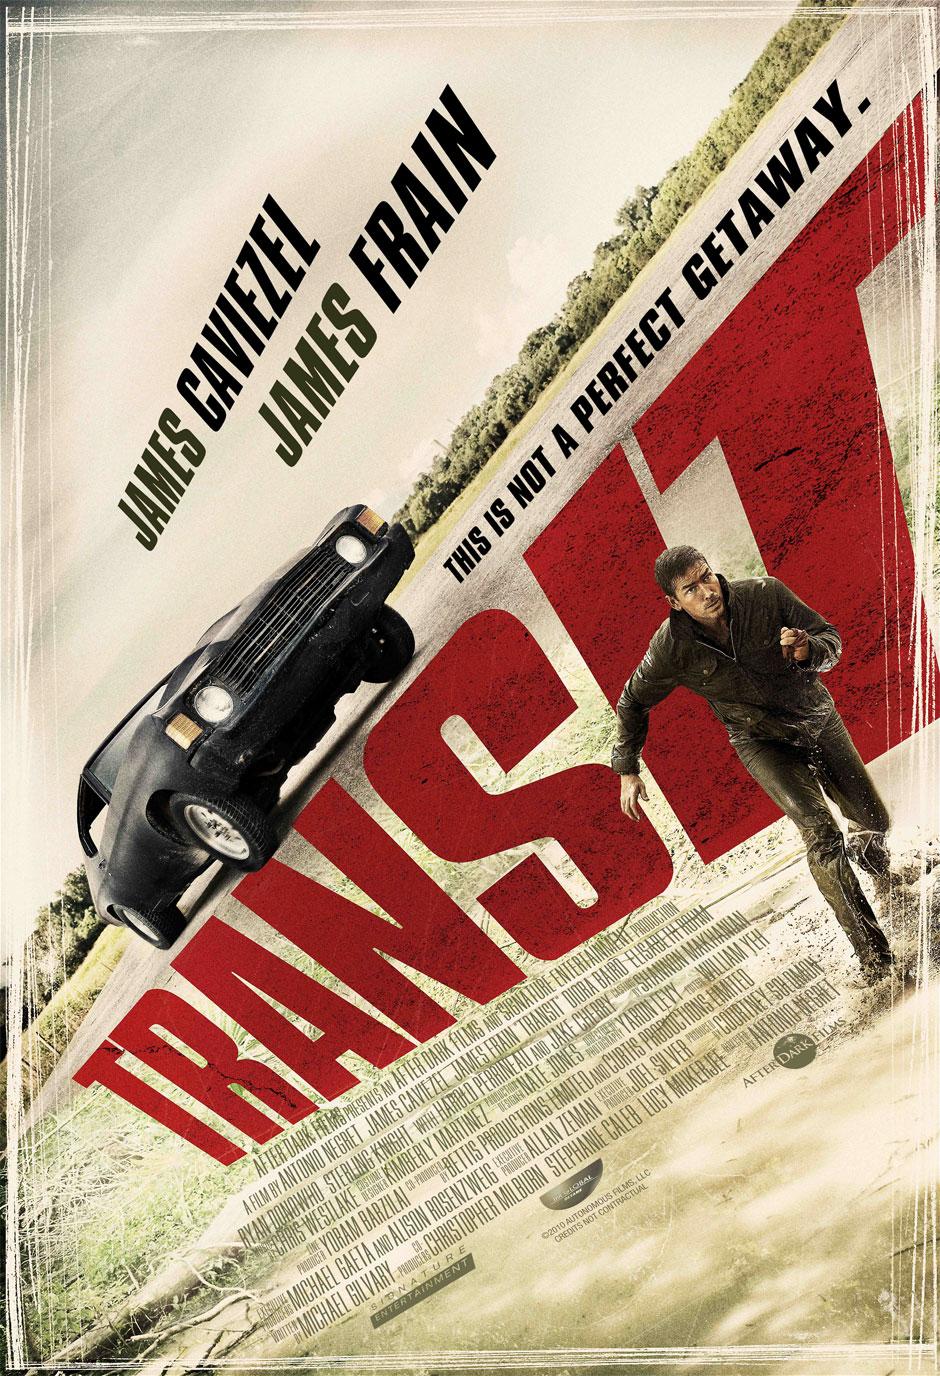 Transit-2011-Movie-Poster.jpg